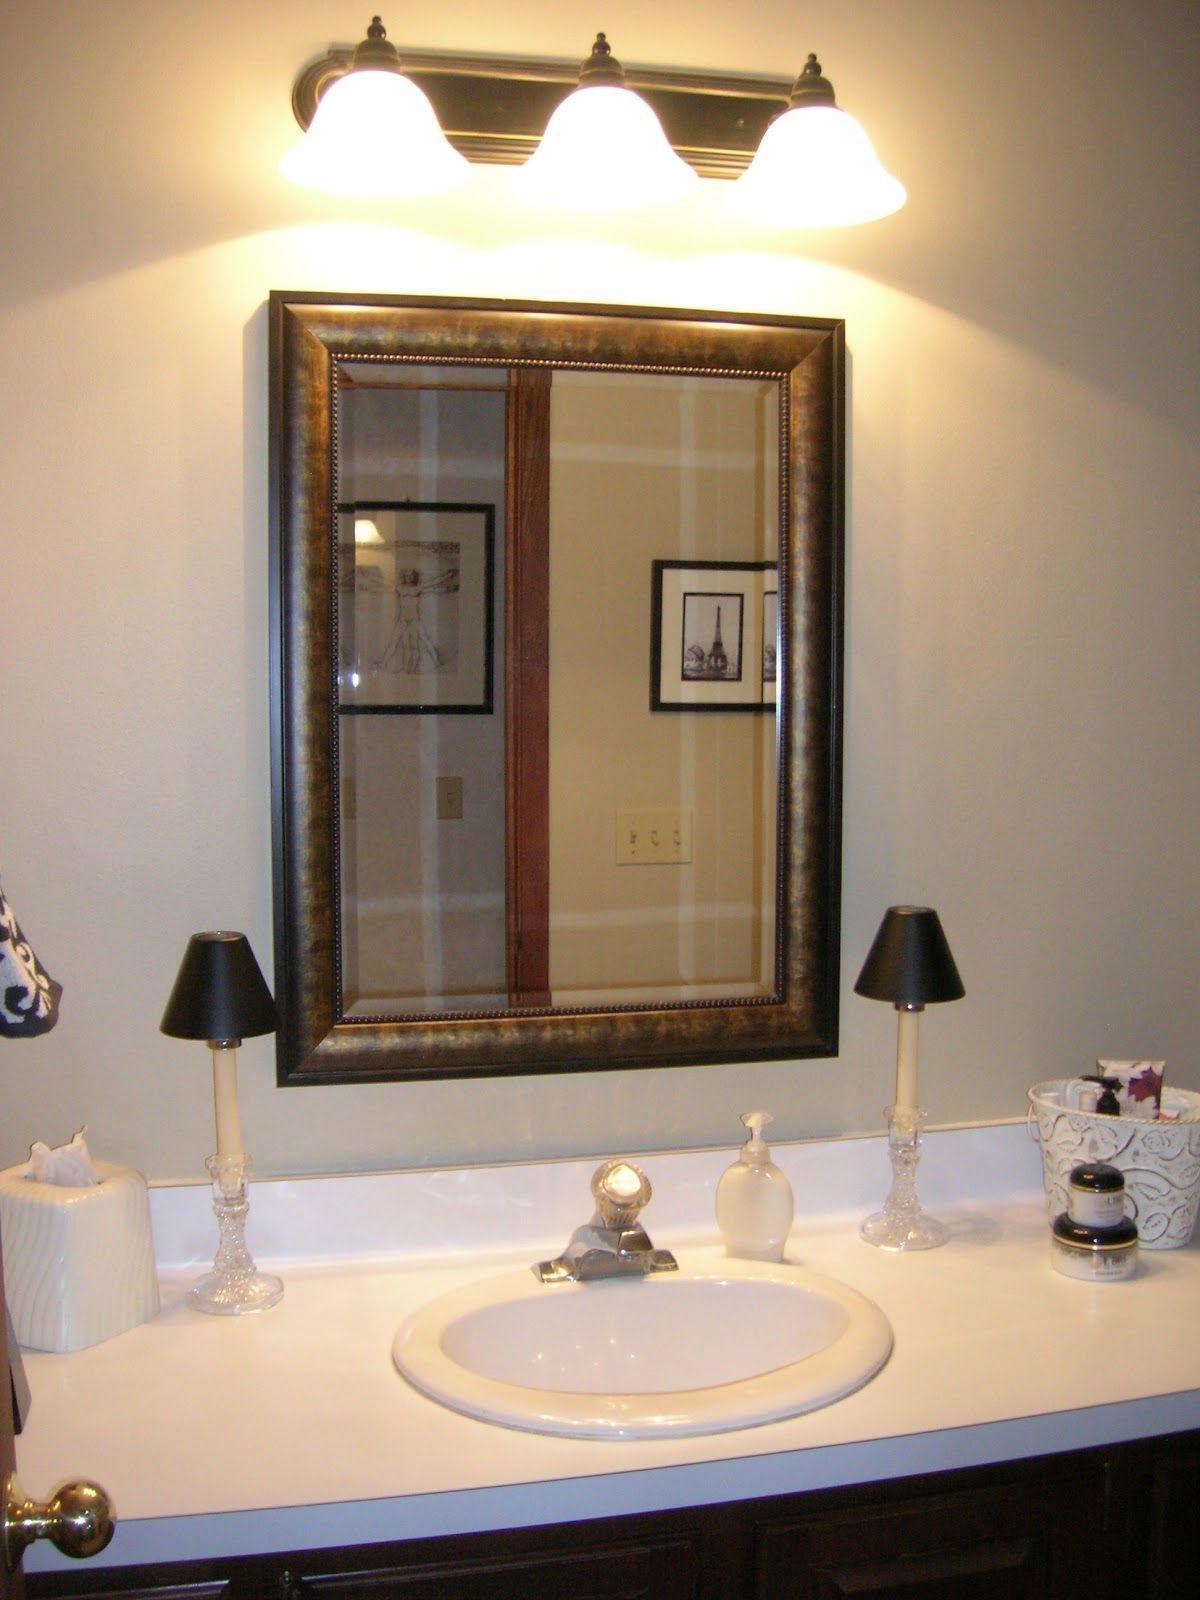 Antique Bathroom Mirror Lights | Bathroom Decor | Pinterest ...